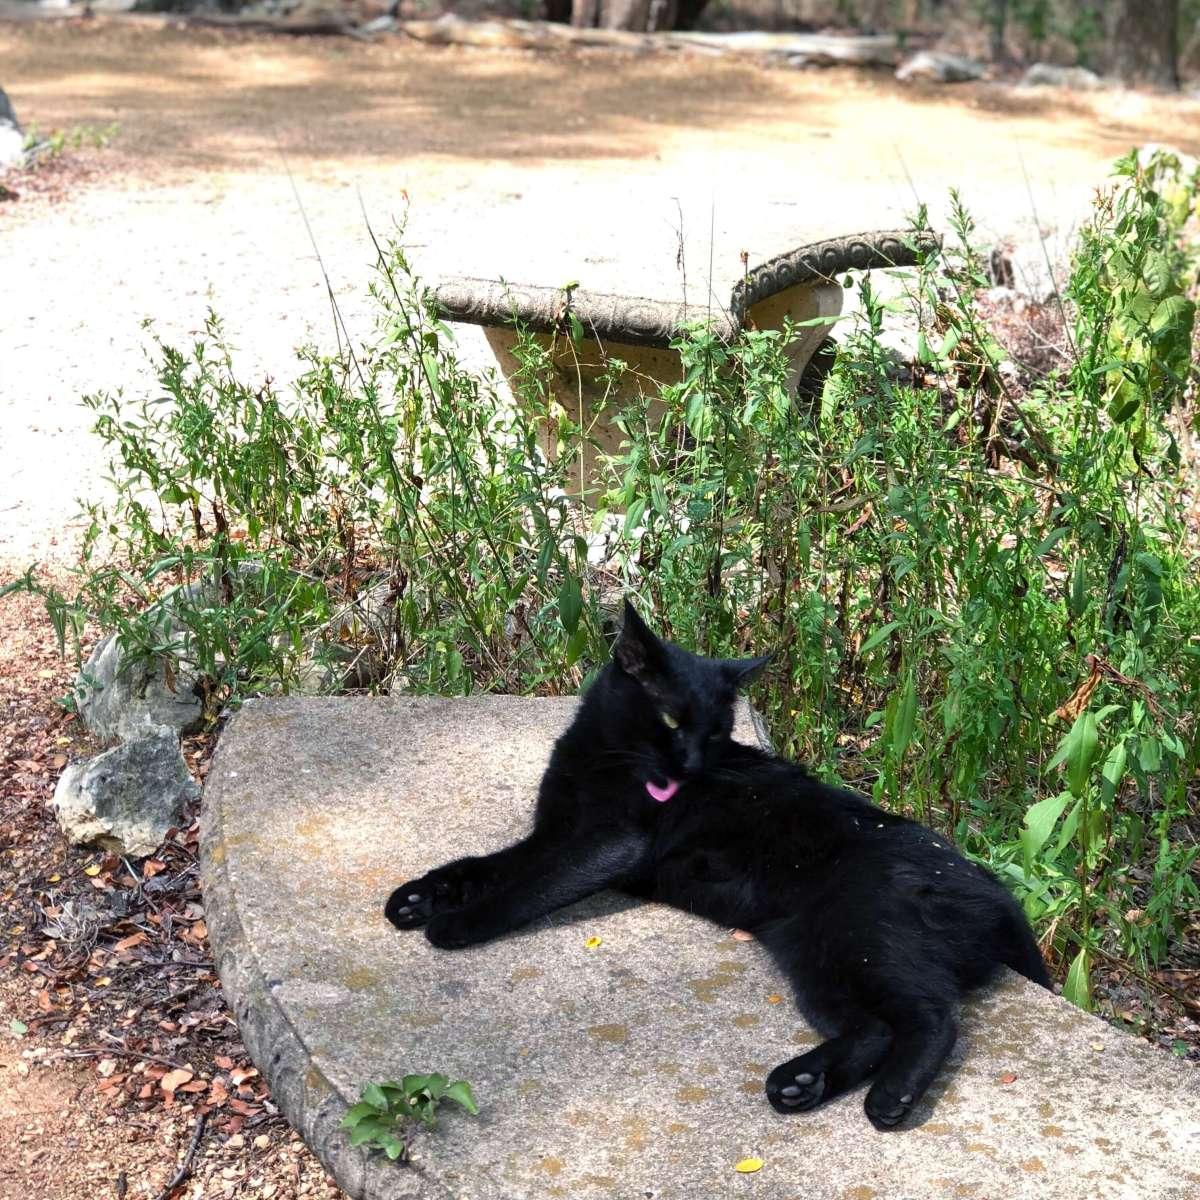 Black cat - Zilker Botanical Garden in Austin, Texas